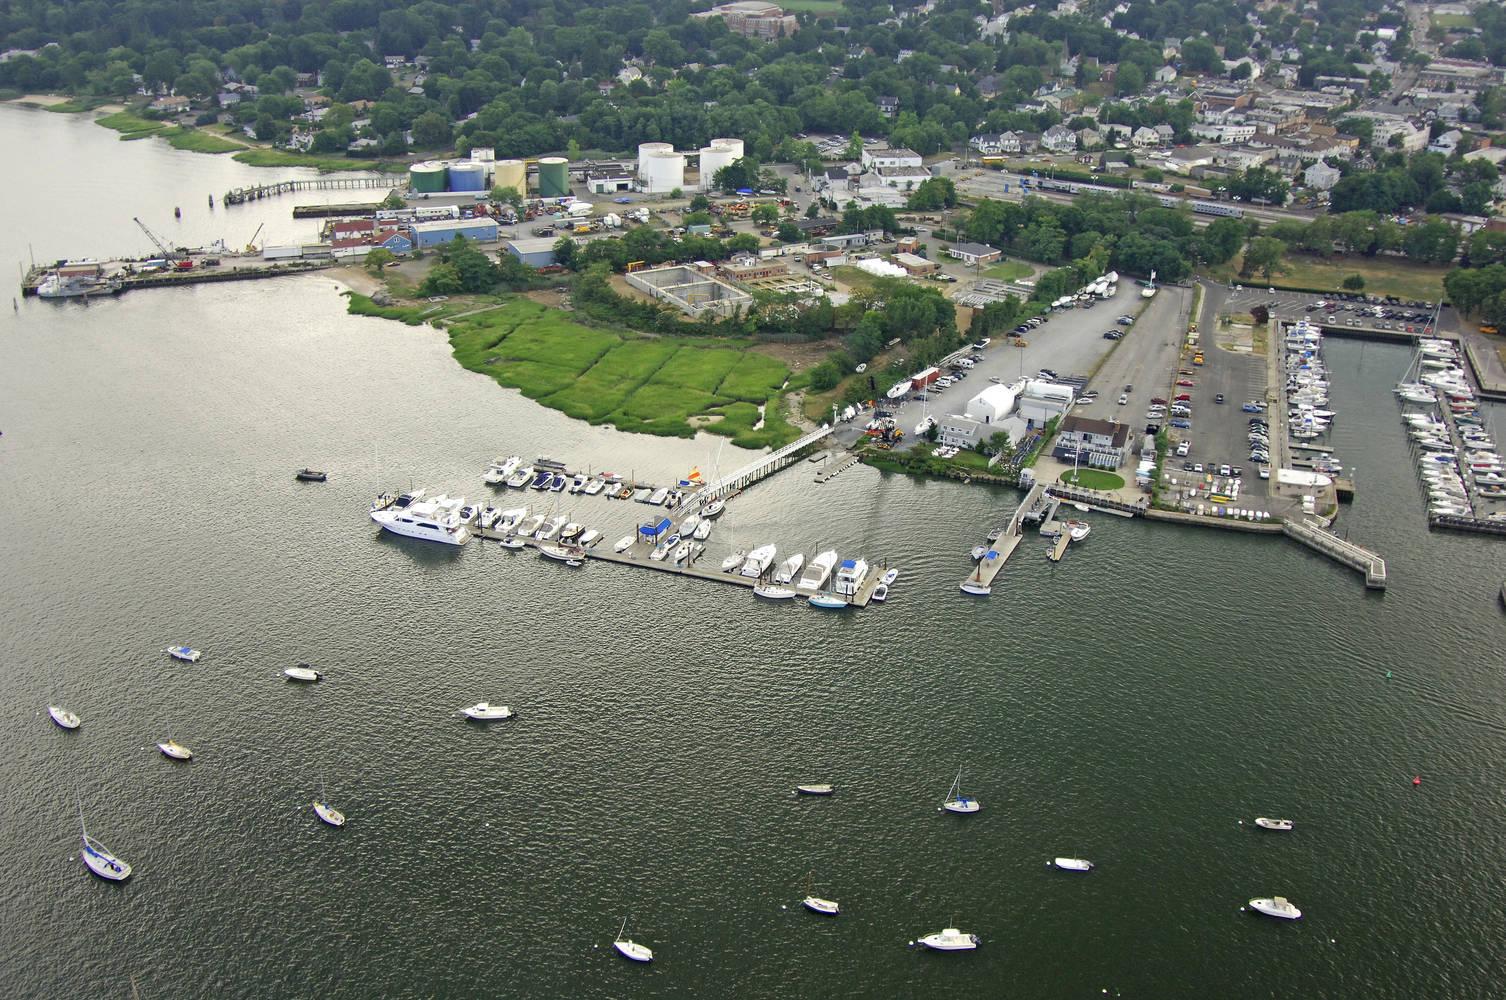 Oyster Bay Marine Center Slip, Dock, Mooring Reservations for Oyster Bay Sanitation Department